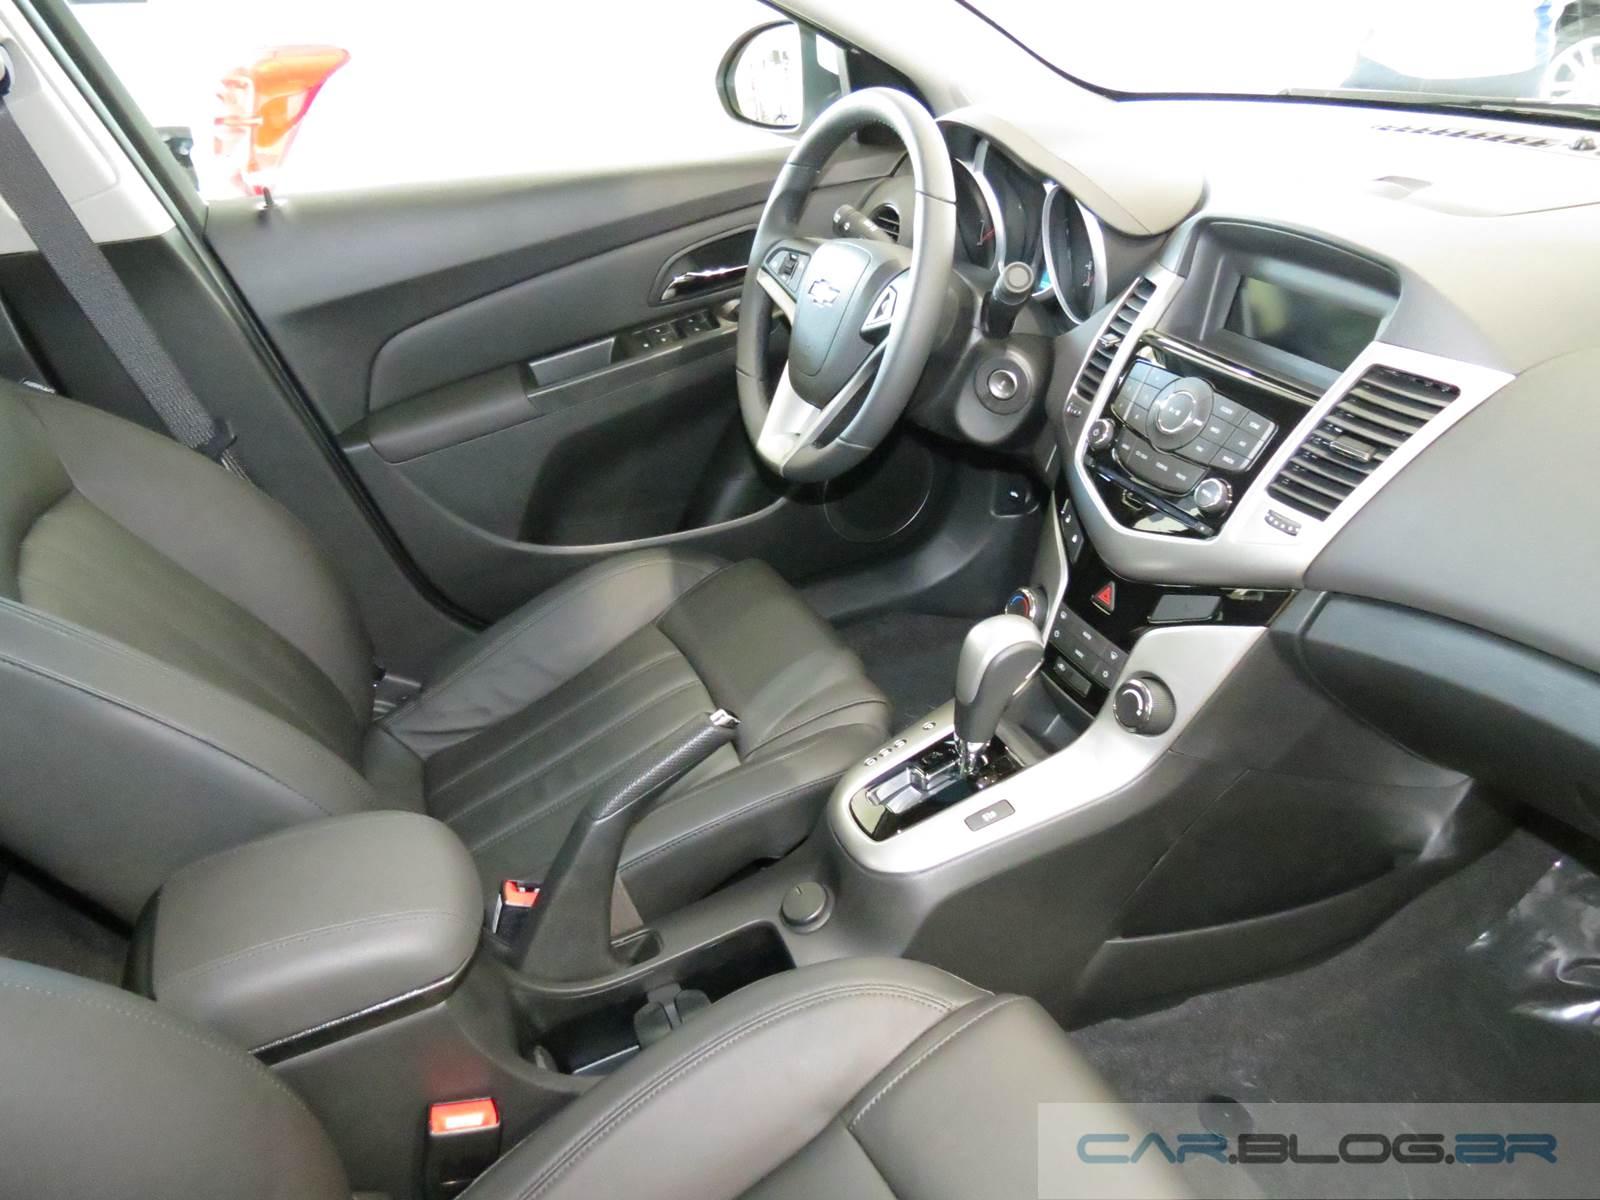 Chevrolet Cruze LT 2016 - interior